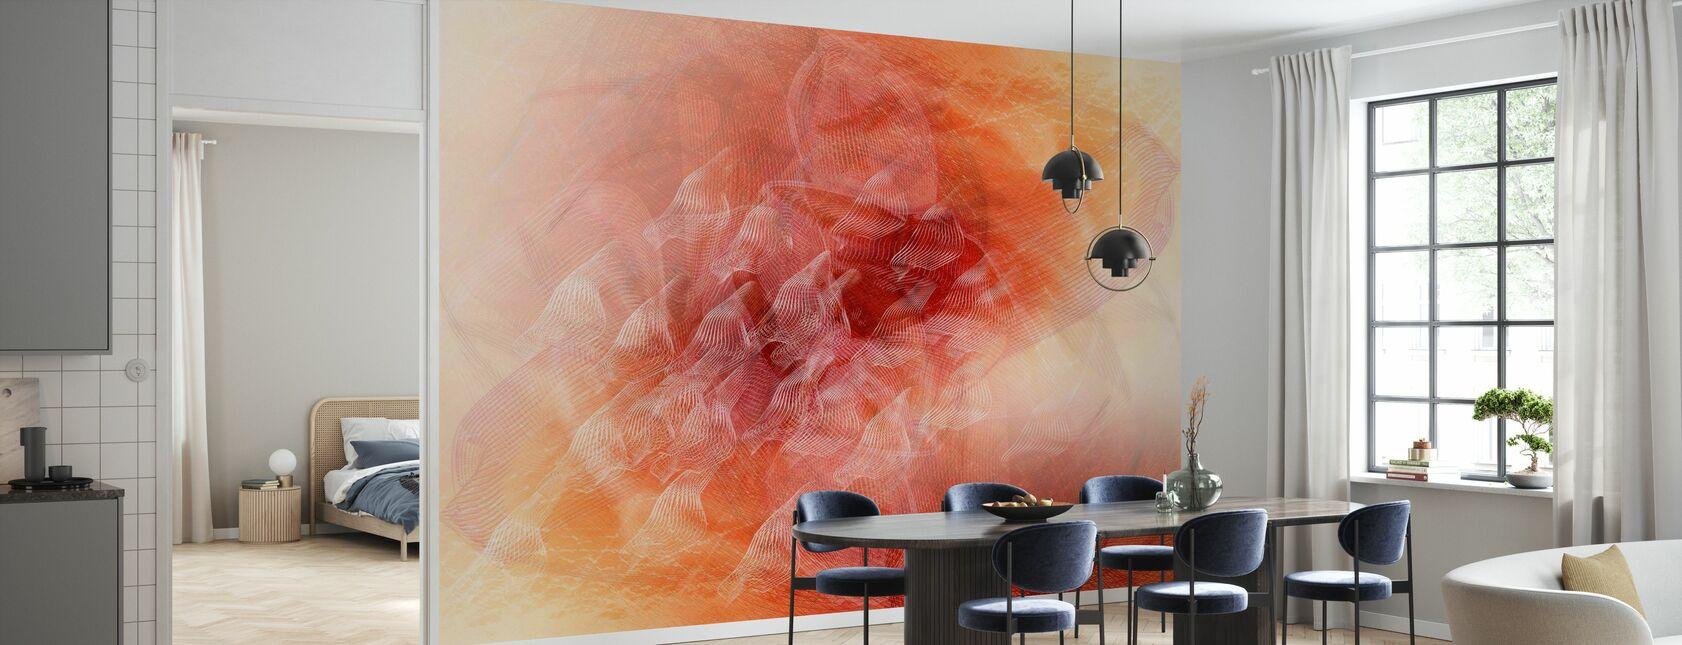 Abstract Flowing Lines - Orange - Wallpaper - Kitchen